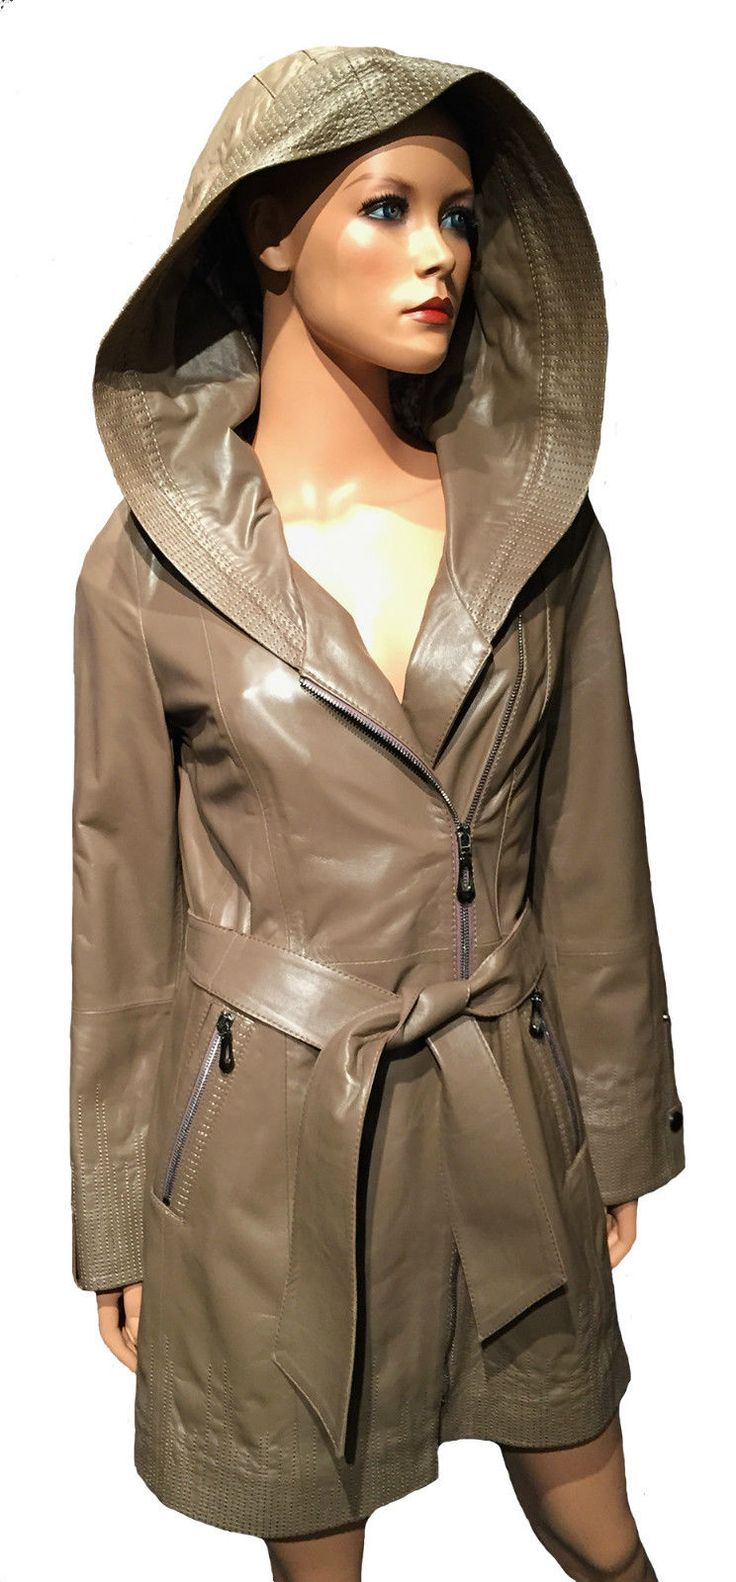 Damen Lederjacke taupe lang Gürtel Kapuze Echtleder Premium Jacke Gr. S M L Neu | eBay